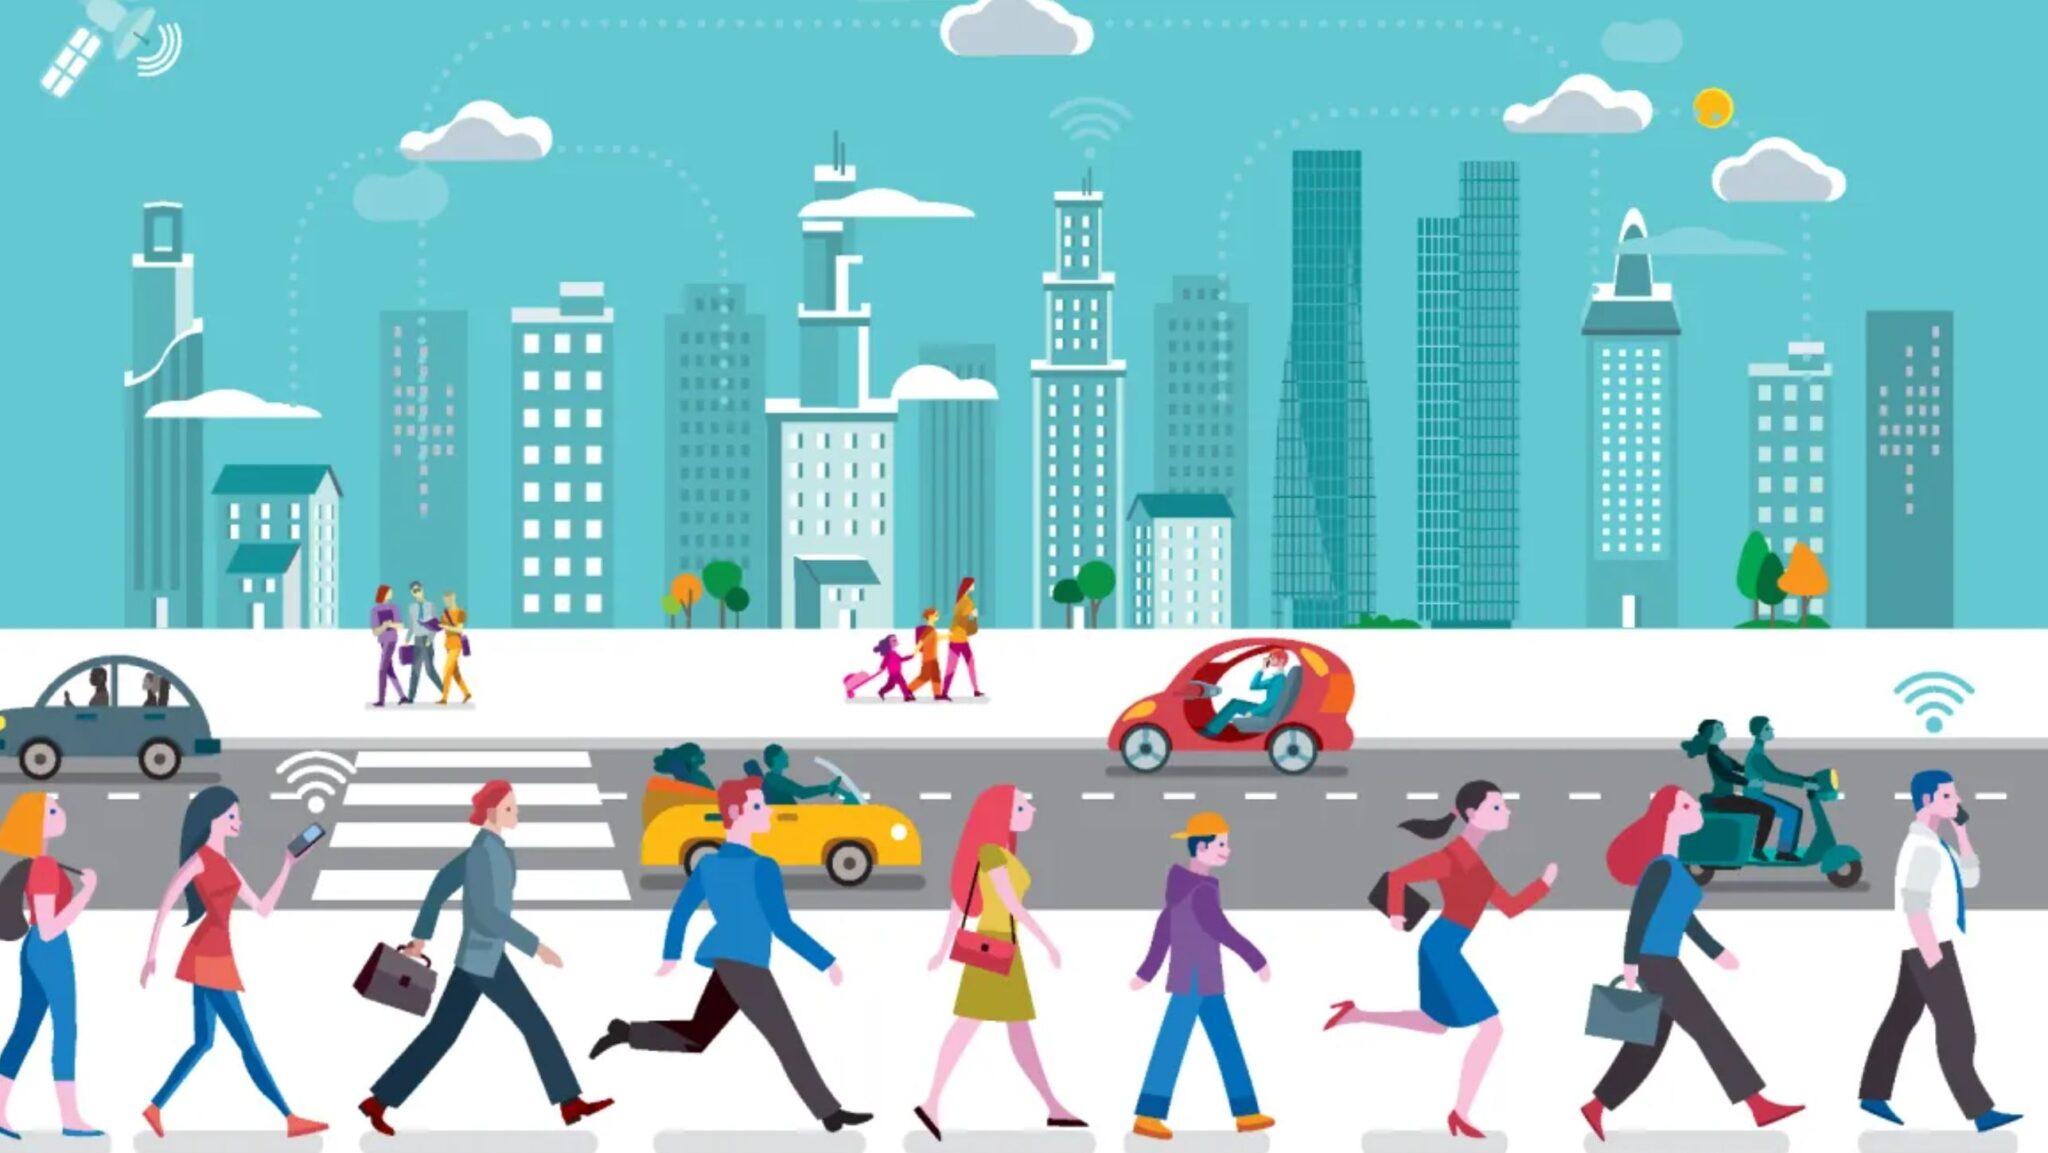 LINK testimonial del corso per i Mobility Manager riconosciuto dal MISE